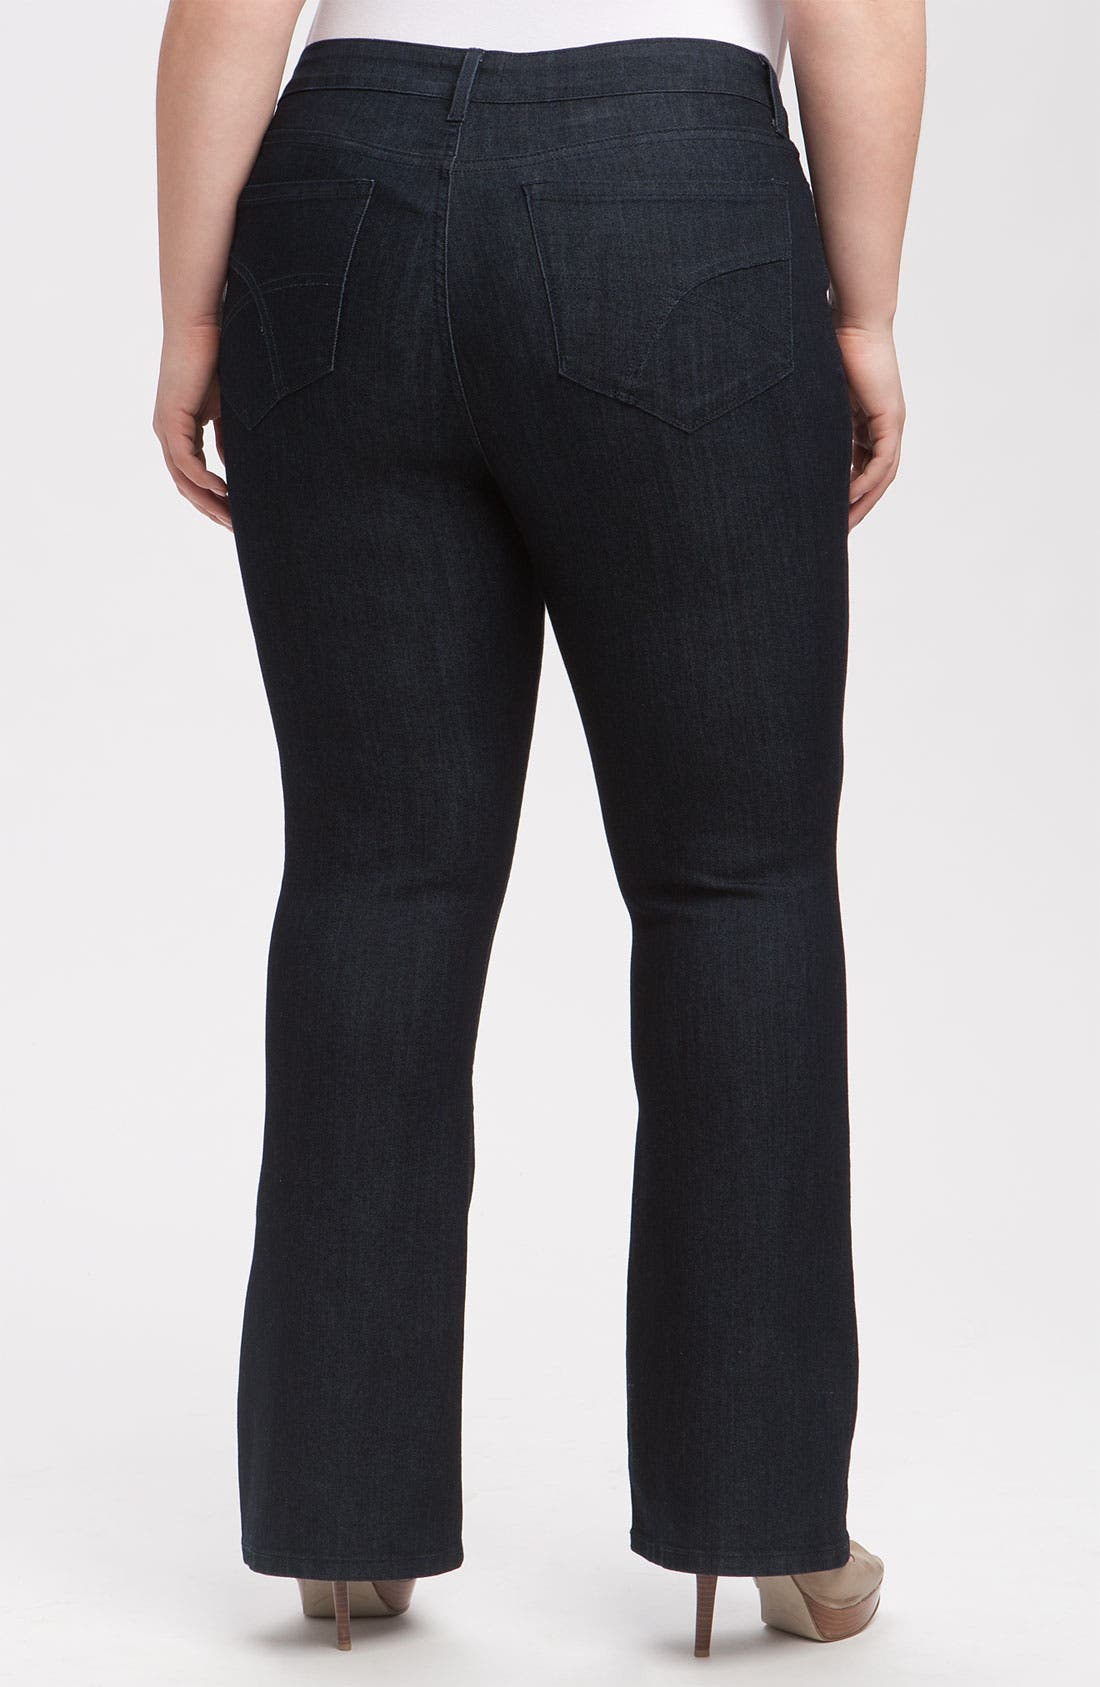 Alternate Image 2  - NYDJ 'Barbara' Stretch Bootcut Jeans (Dark Enzyme) (Plus Size)